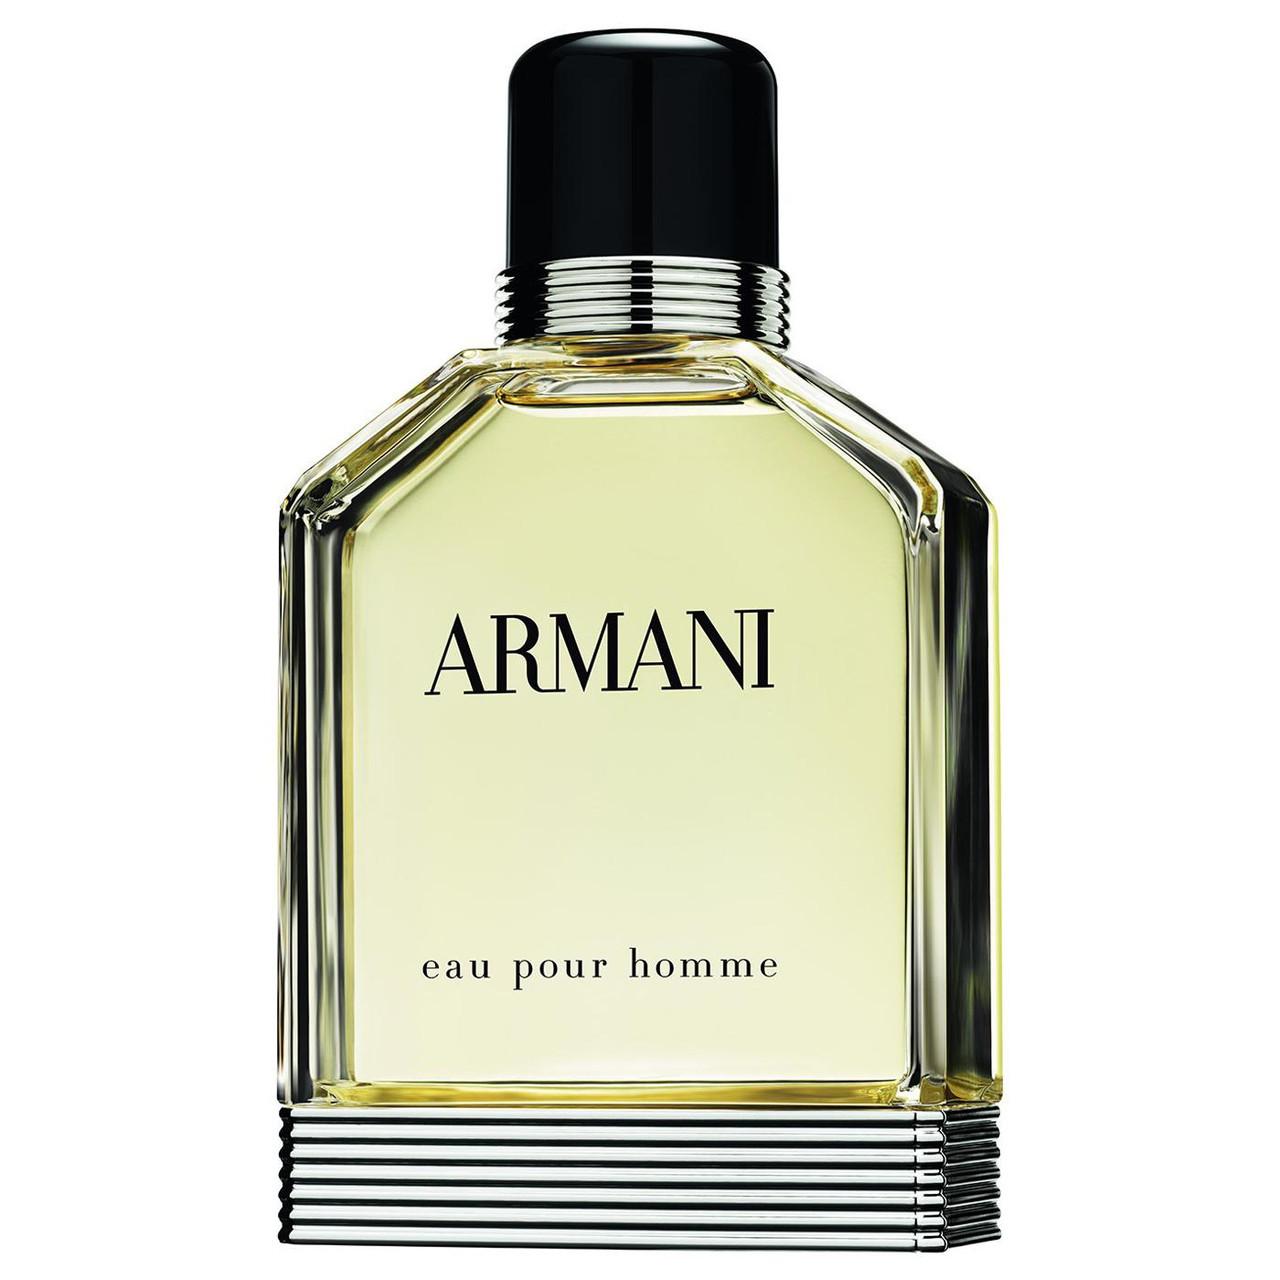 Оригінал Giorgio Armani Eau Pour Homme edt 100ml (стильний, класичний, глибокий, багатогранний)